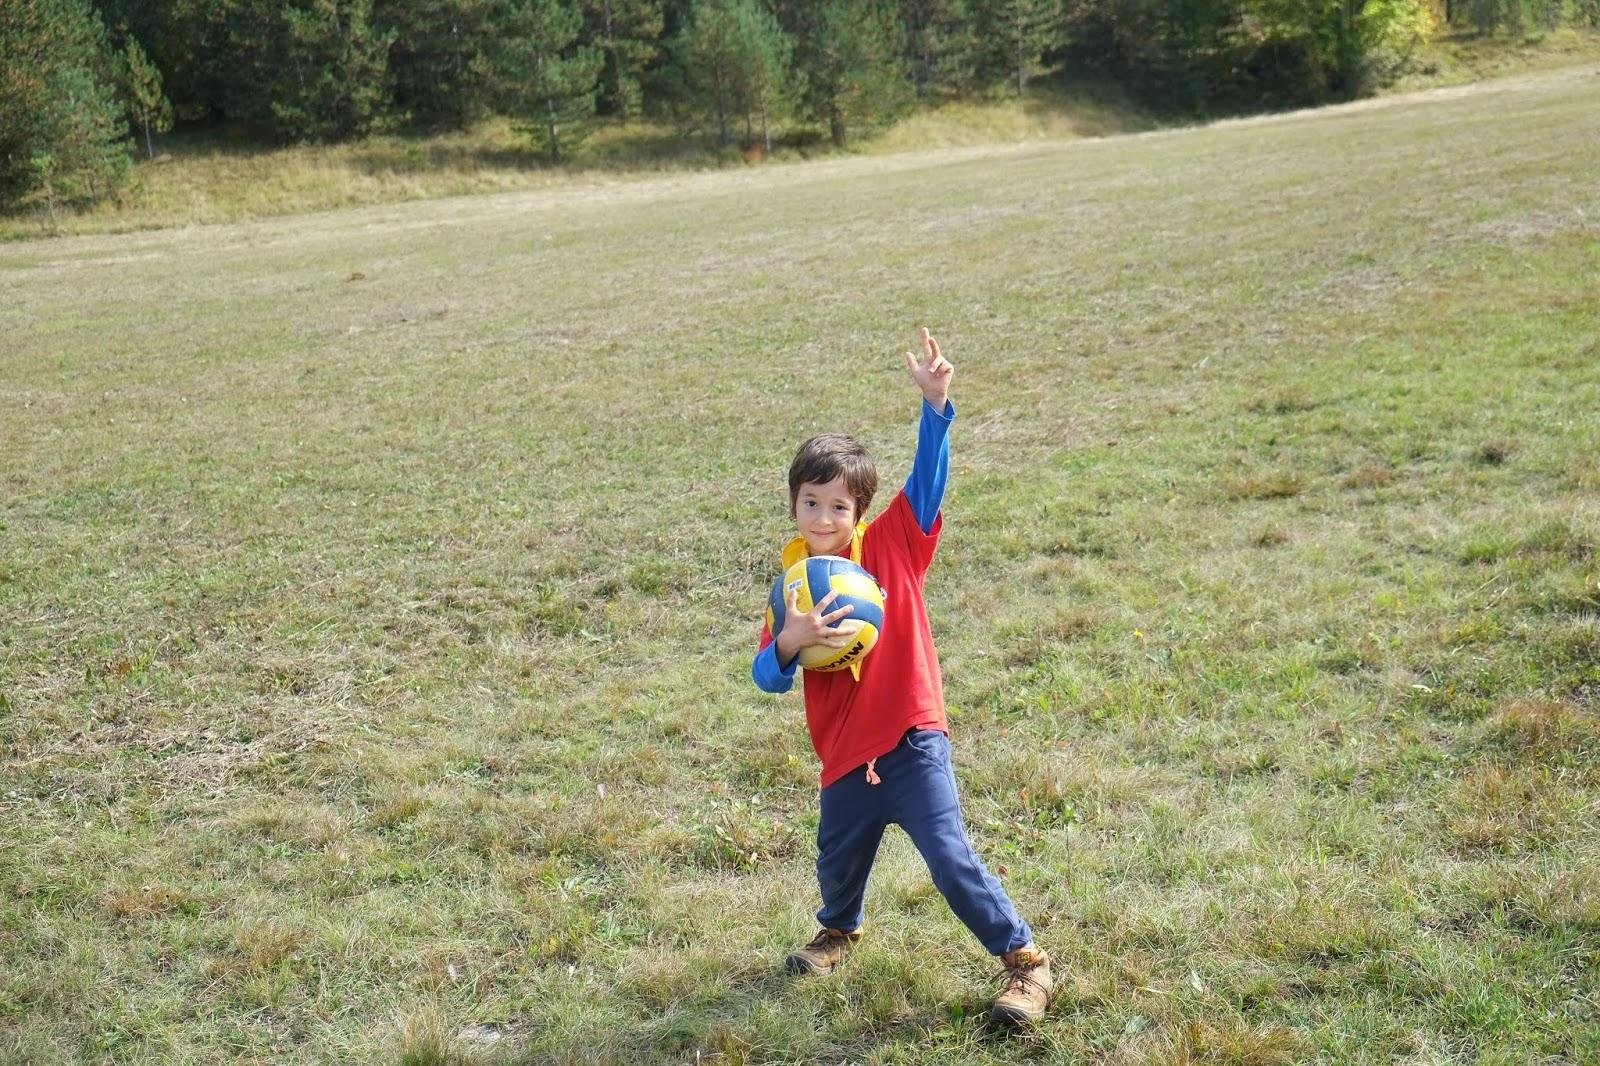 Pohod na Kozlek, Kozlek, 11.10.2014 - DSCF1211.JPG